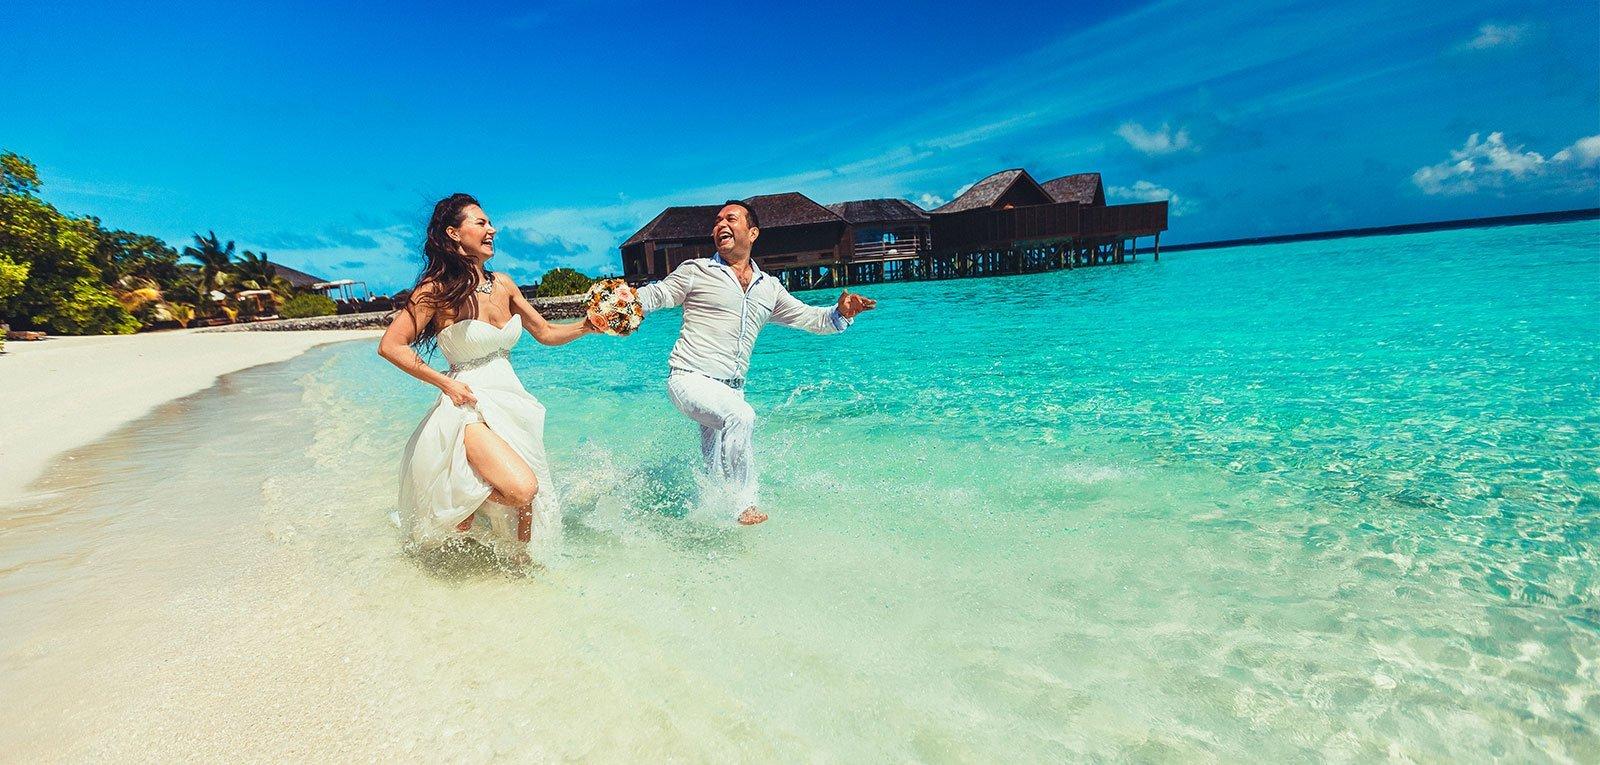 lily beach honeymoon gifts